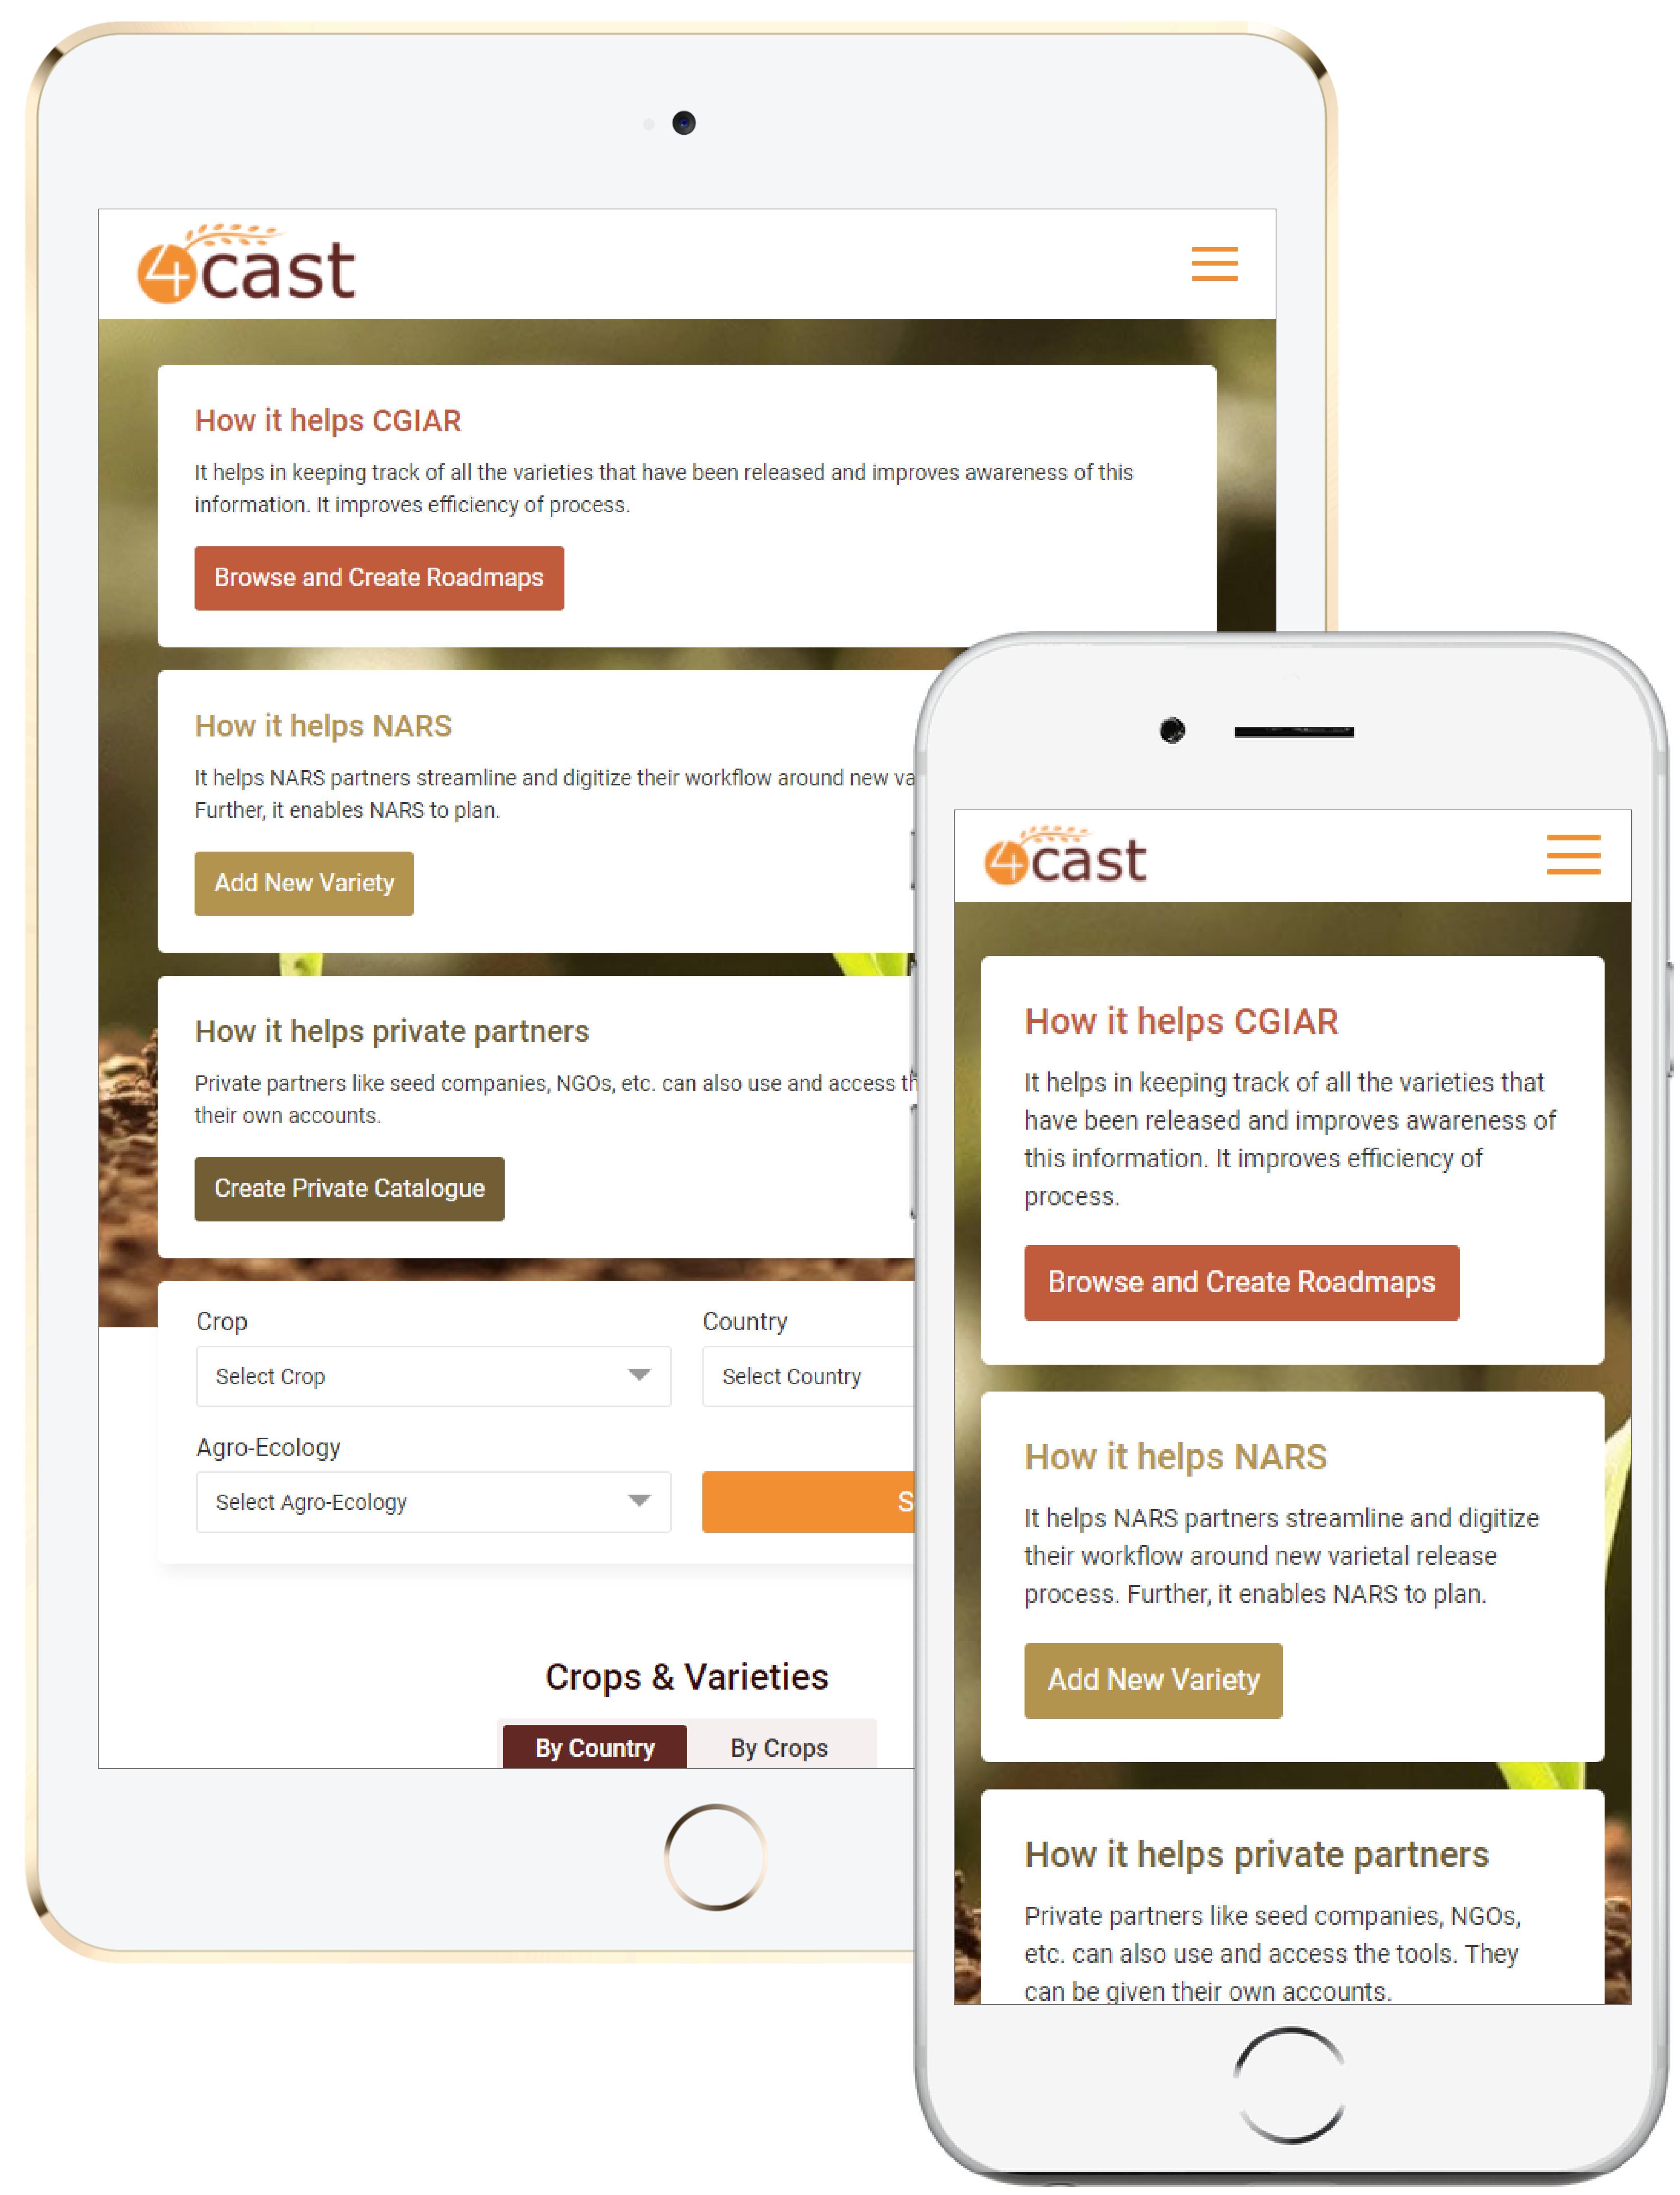 4cast Responsive Website Design